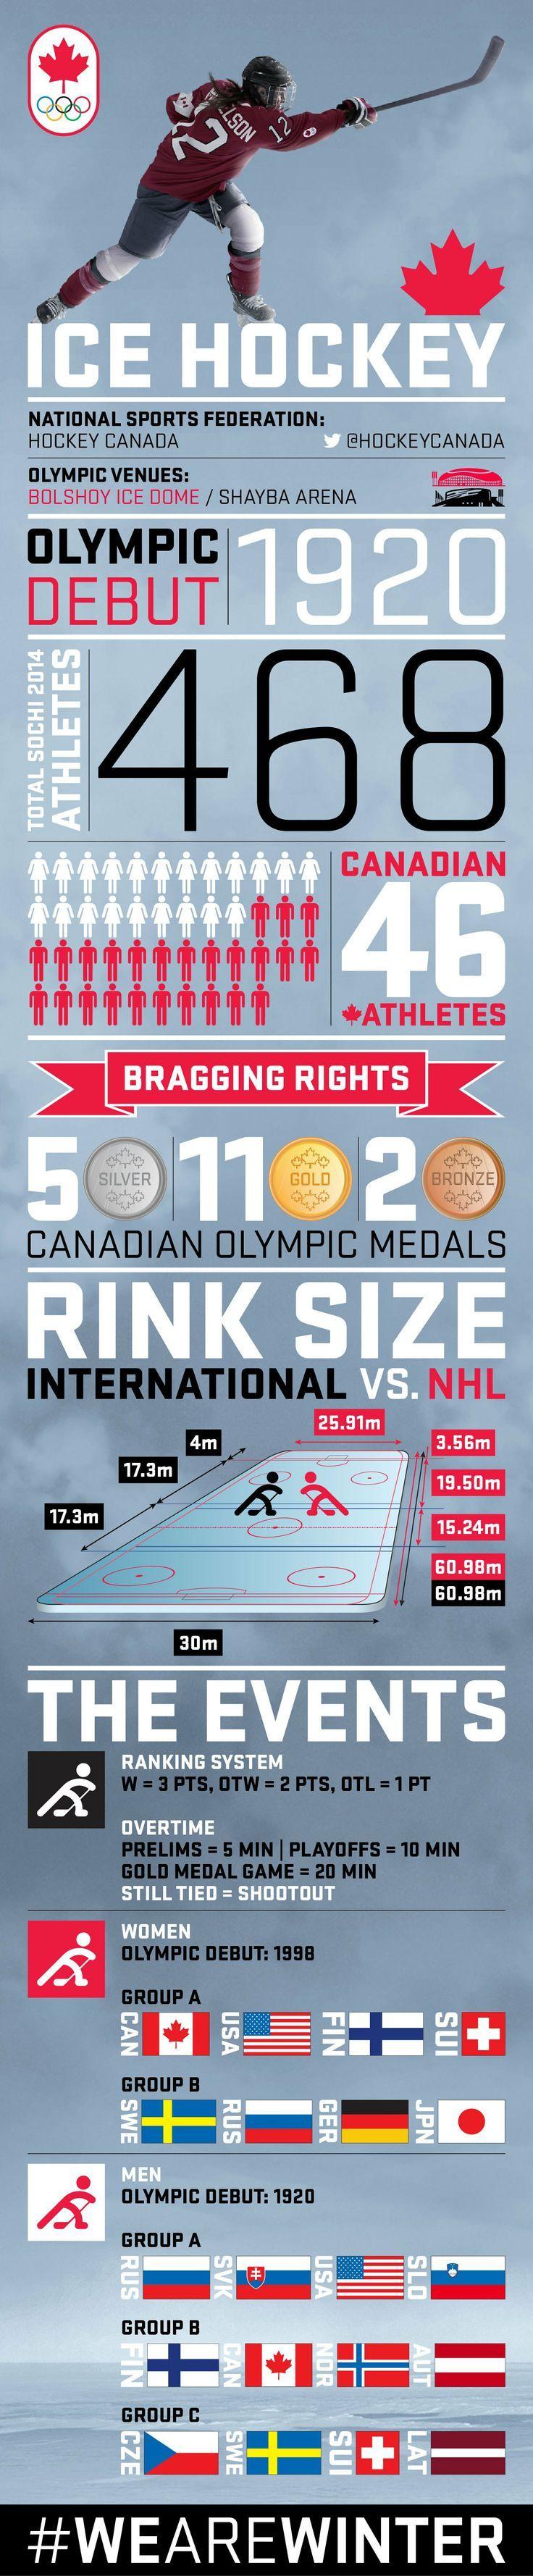 Sochi 2014 - WInter Olympic Games - Ice Hockey - Infographic